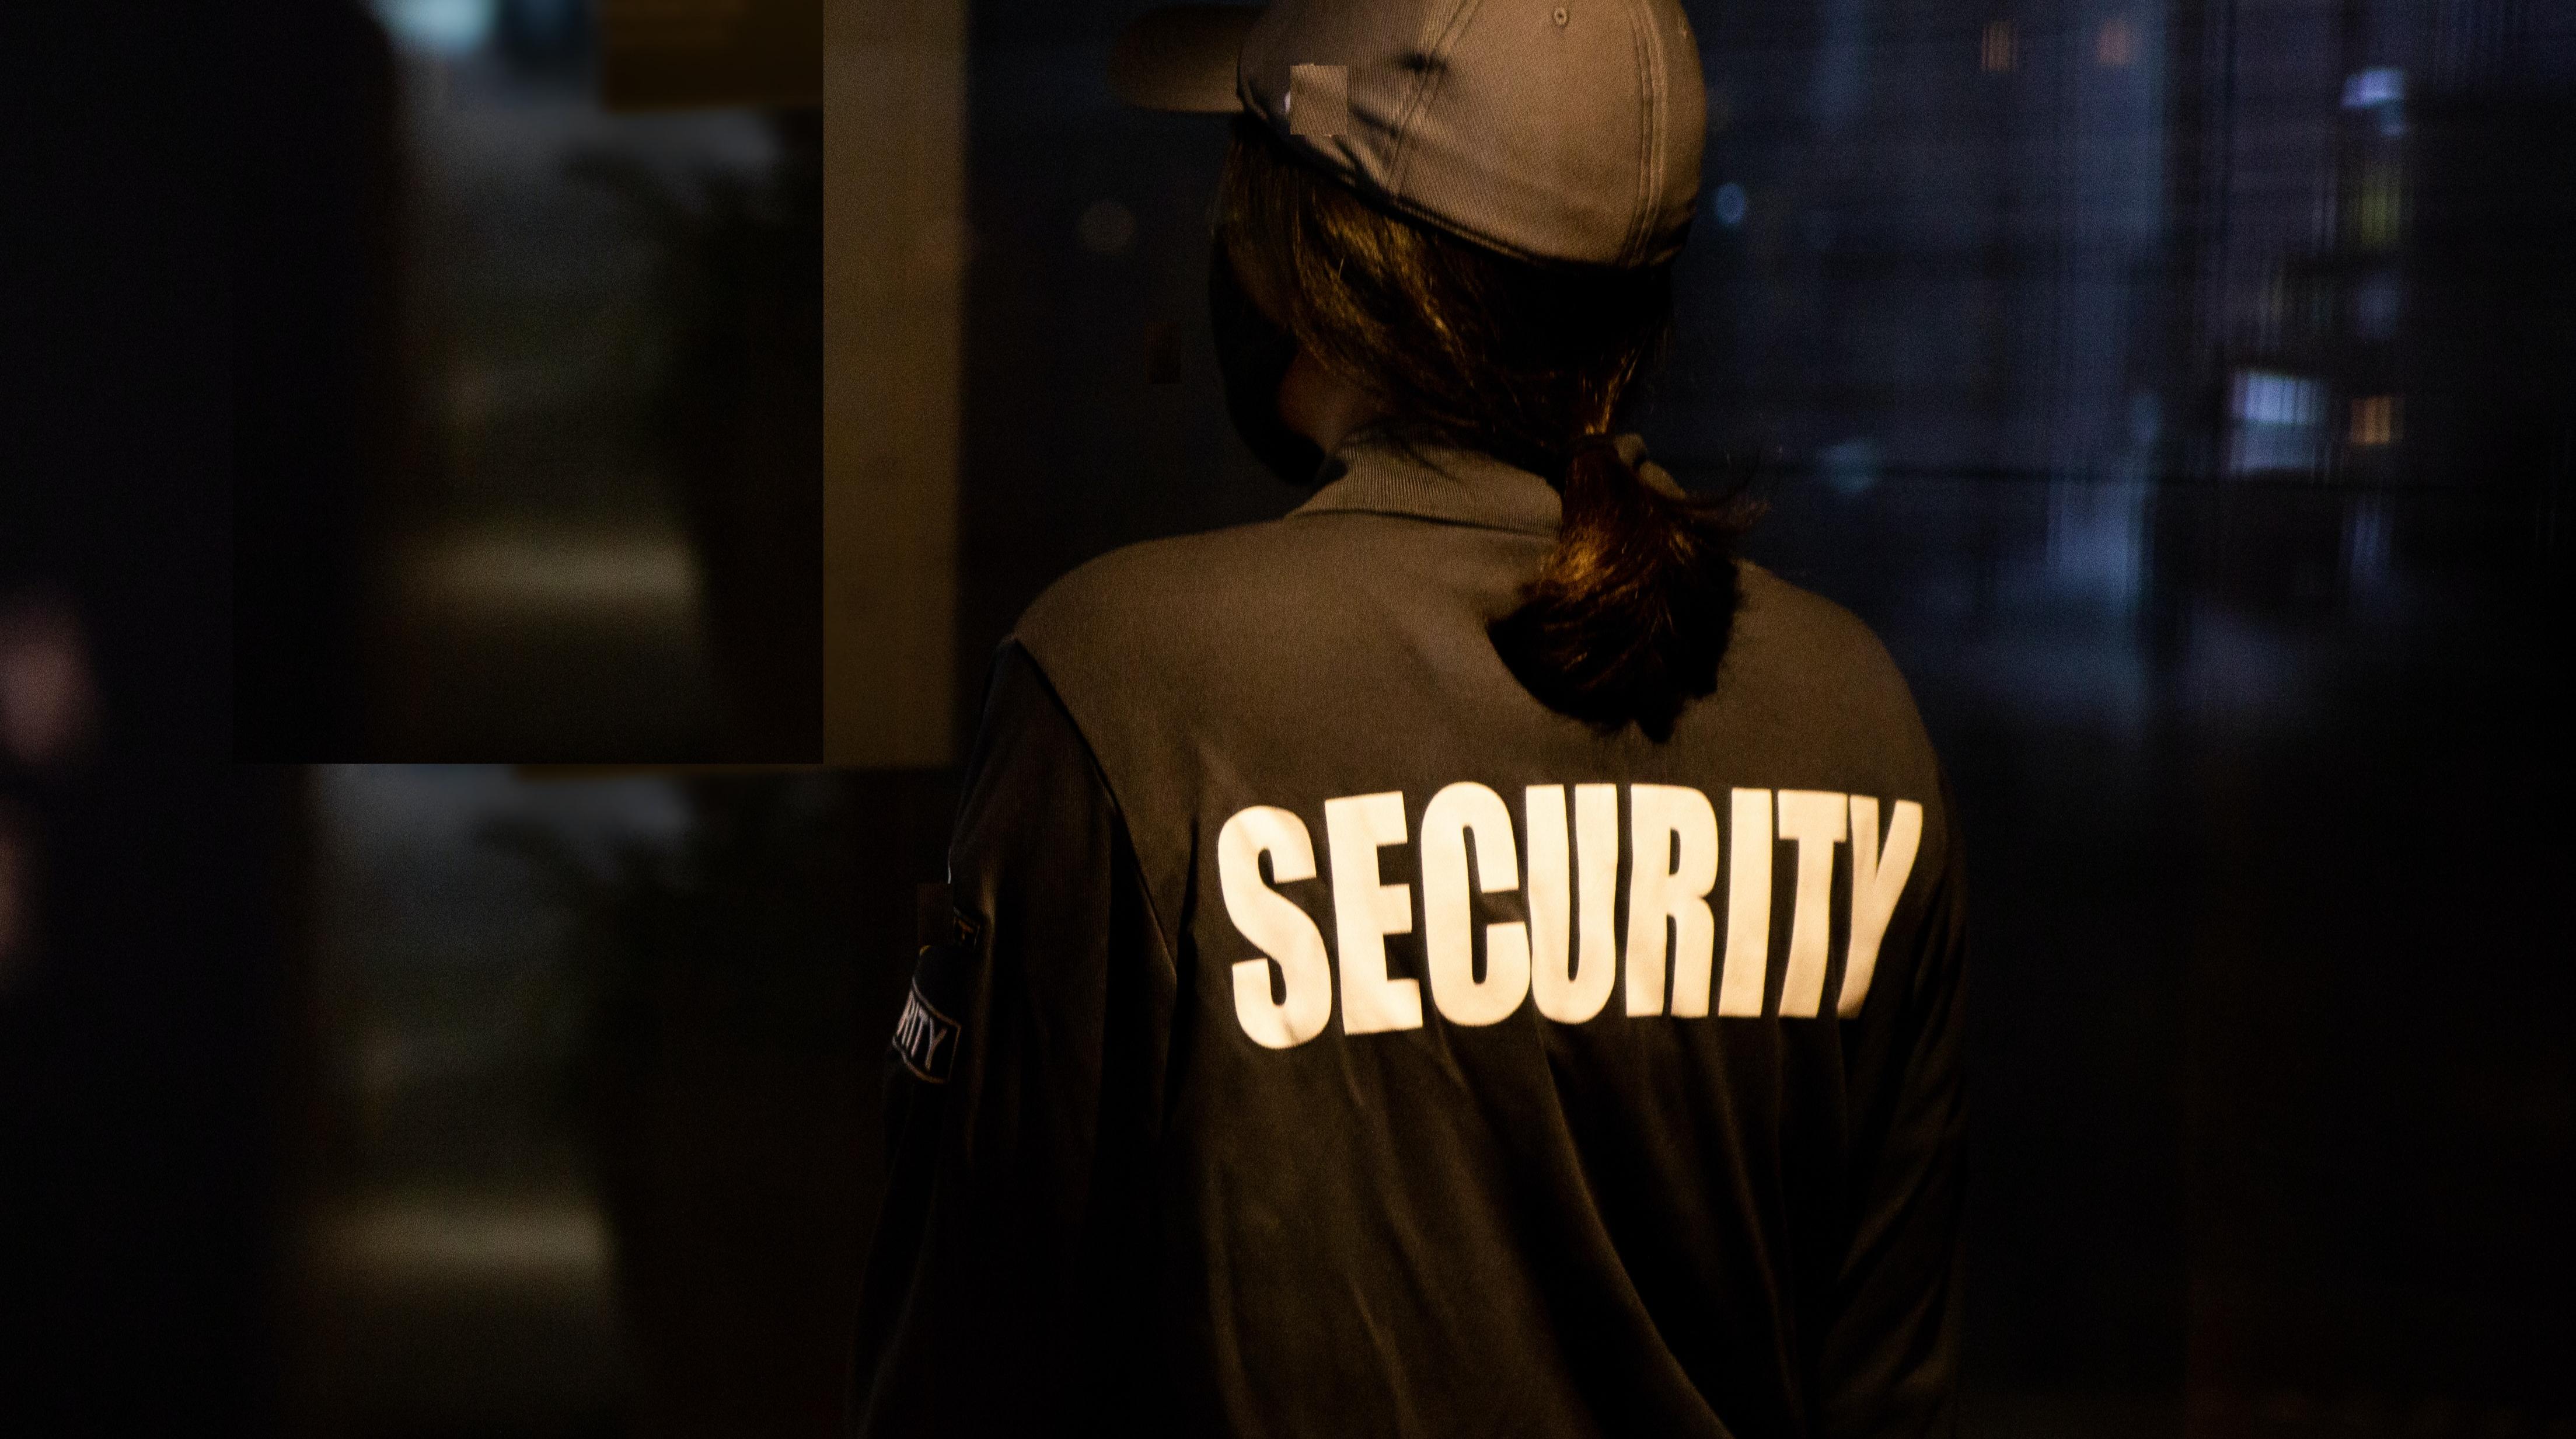 flex-point-security-ut4dQ0KqsQE-unsplash-copy.jpg